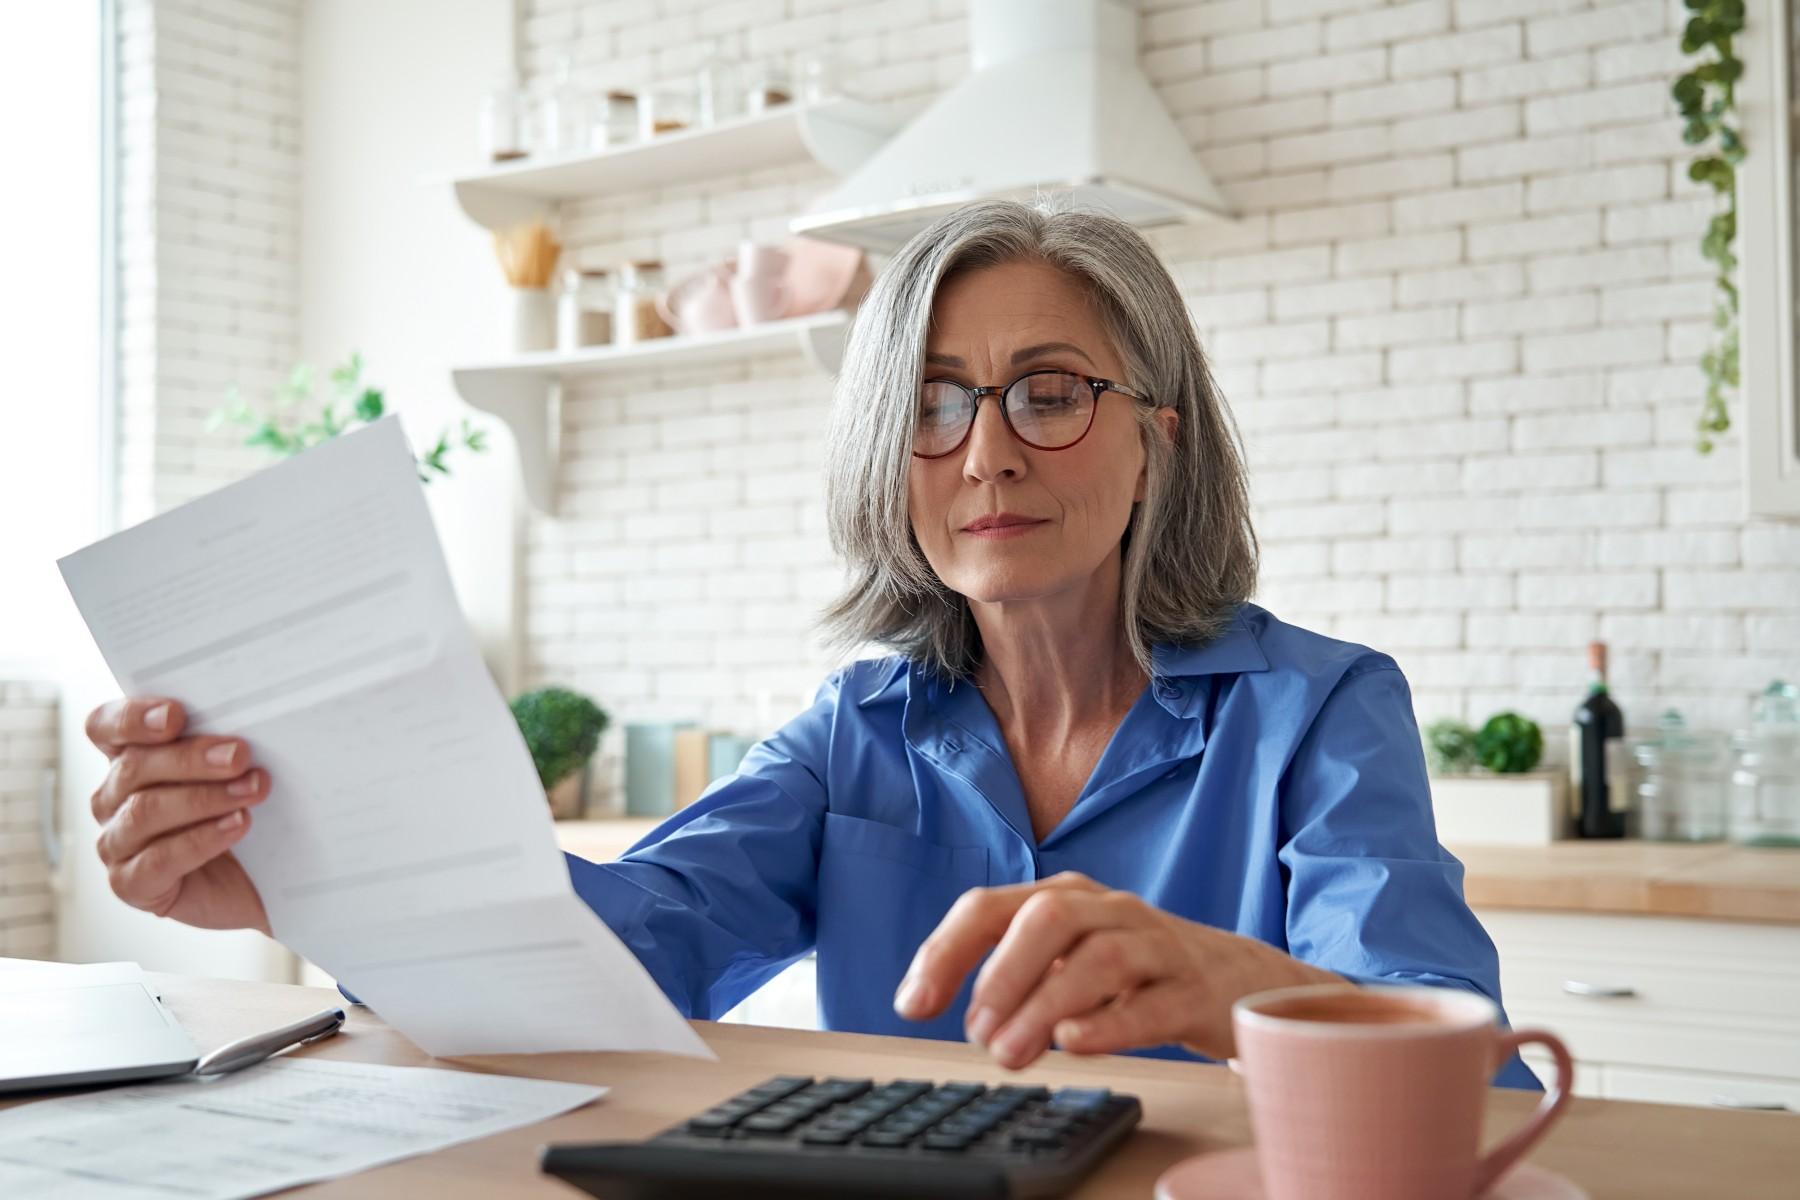 Switzerland labor laws, Swiss woman calculates retirement